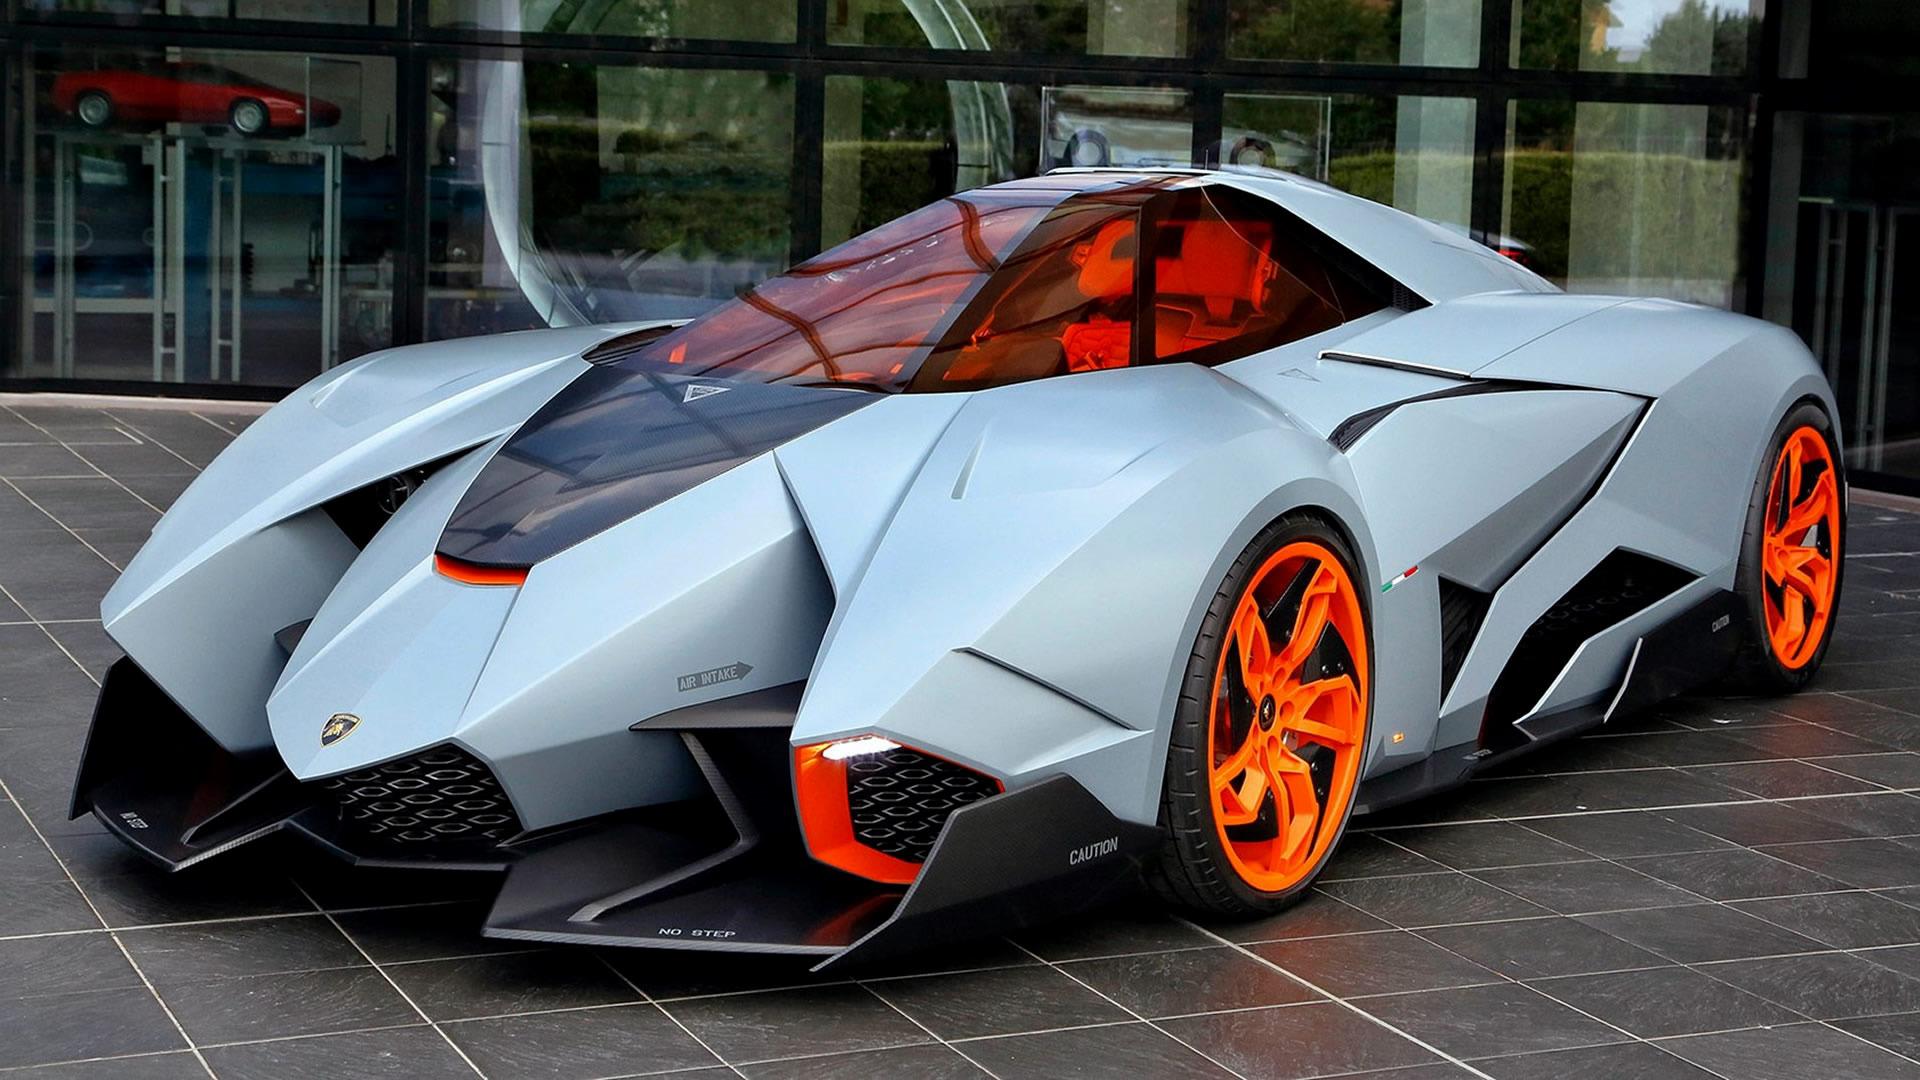 Lamborghini Egoista (2013) Wallpapers and HD Images - Car ...